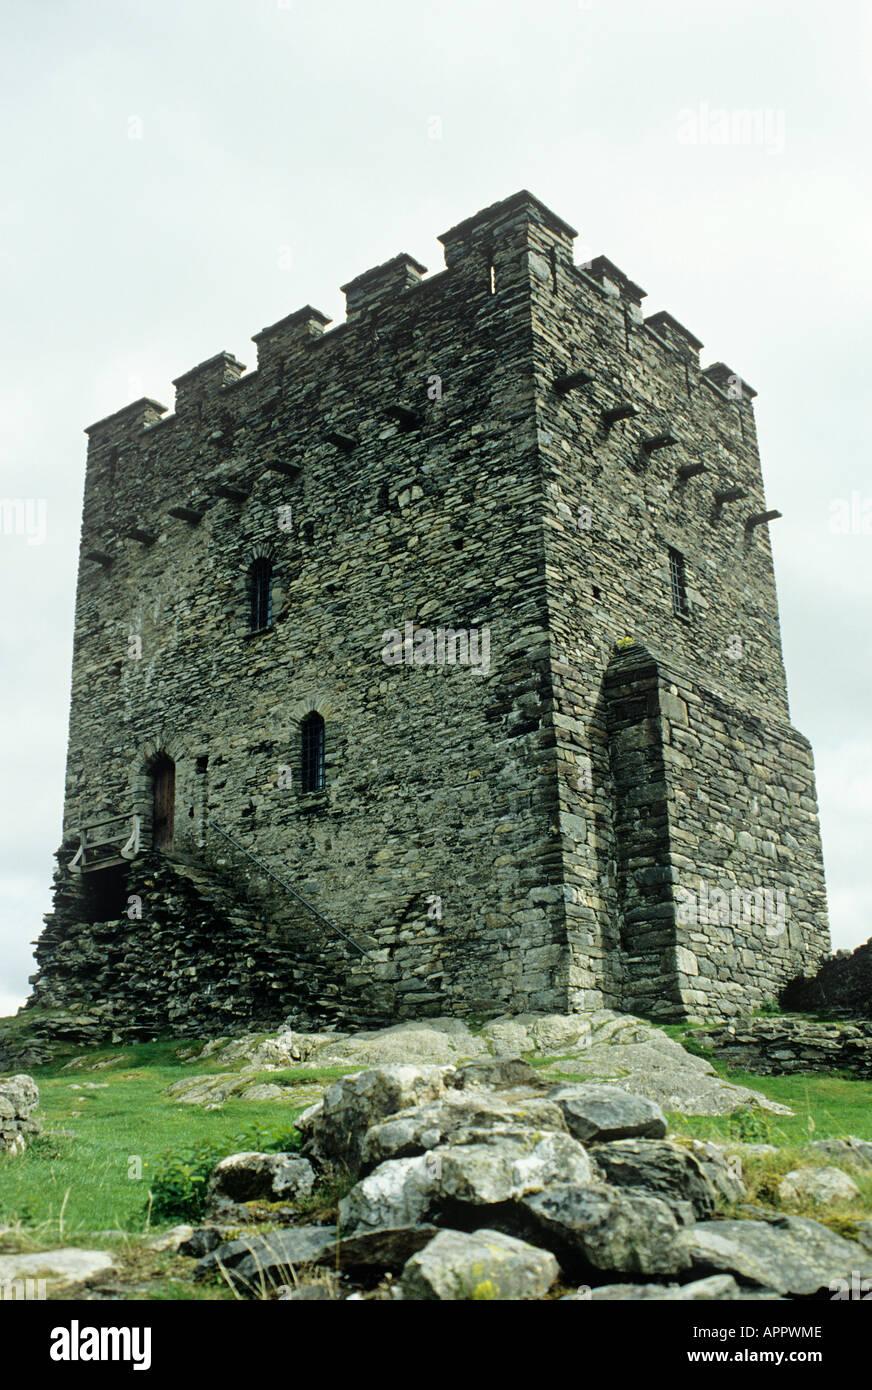 Embattled rectangular tower keep of 13th century Dolwyddelan Castle Snowdonia - Stock Image